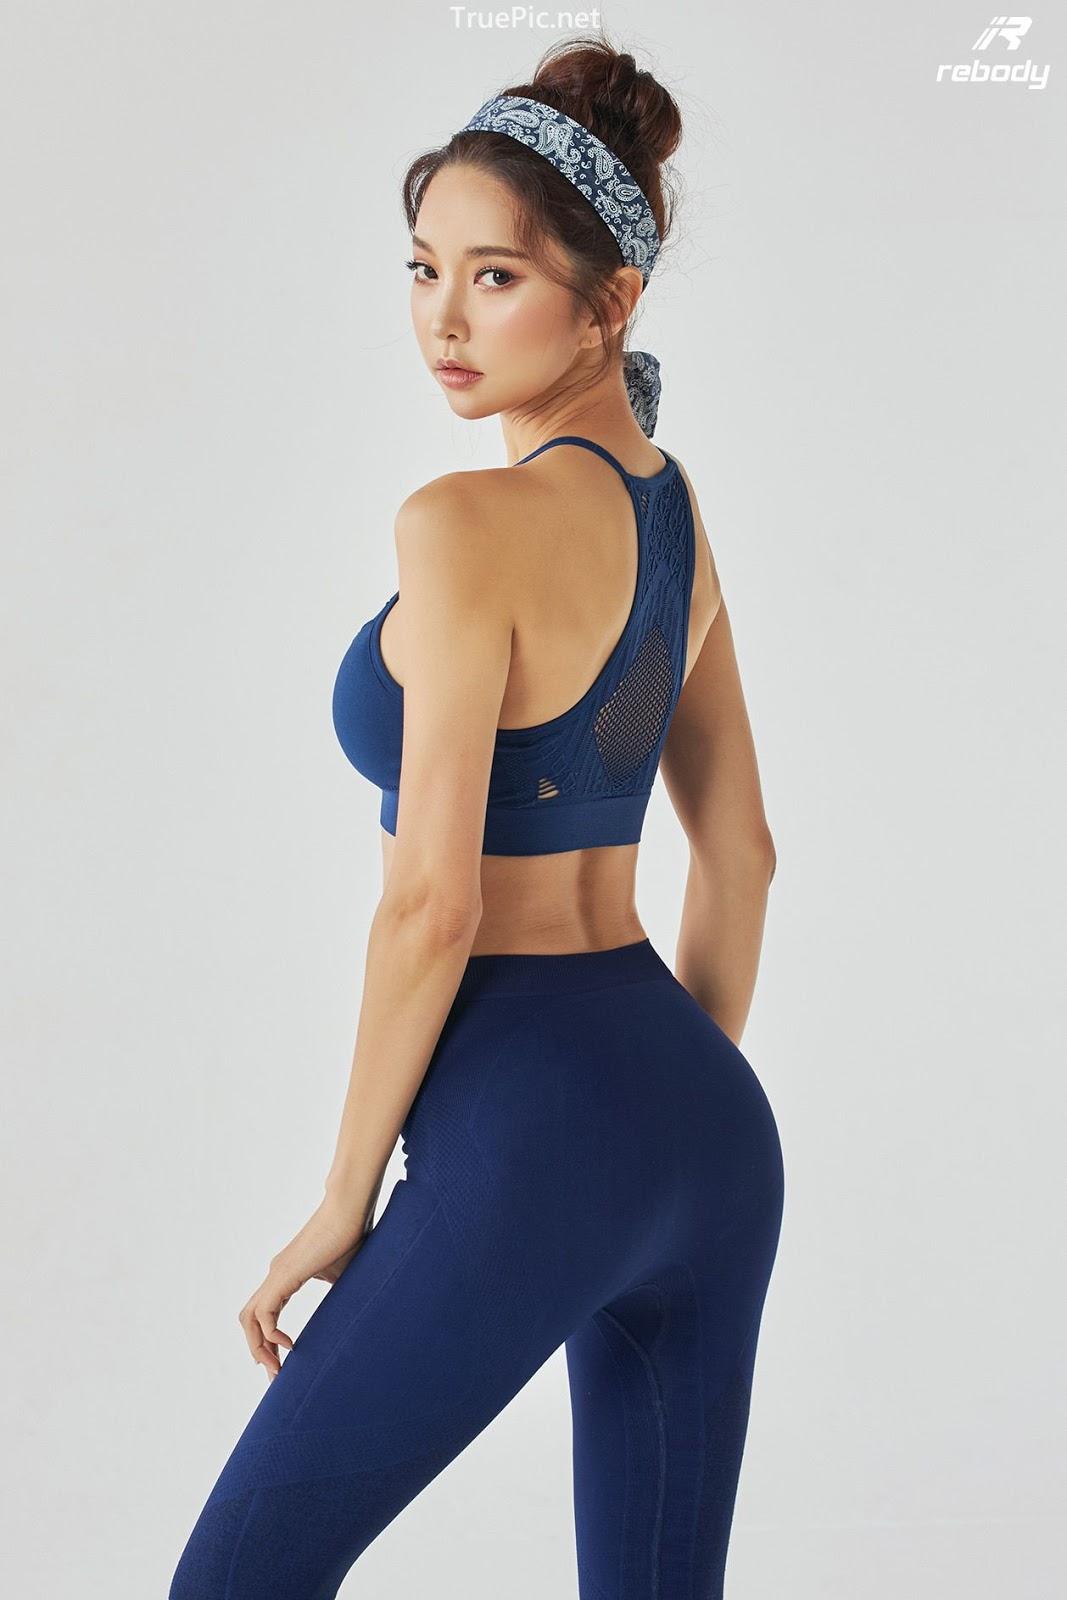 Park Soo Yeon - Sports Bra Fitness Set - Korean fashion model - Picture 4